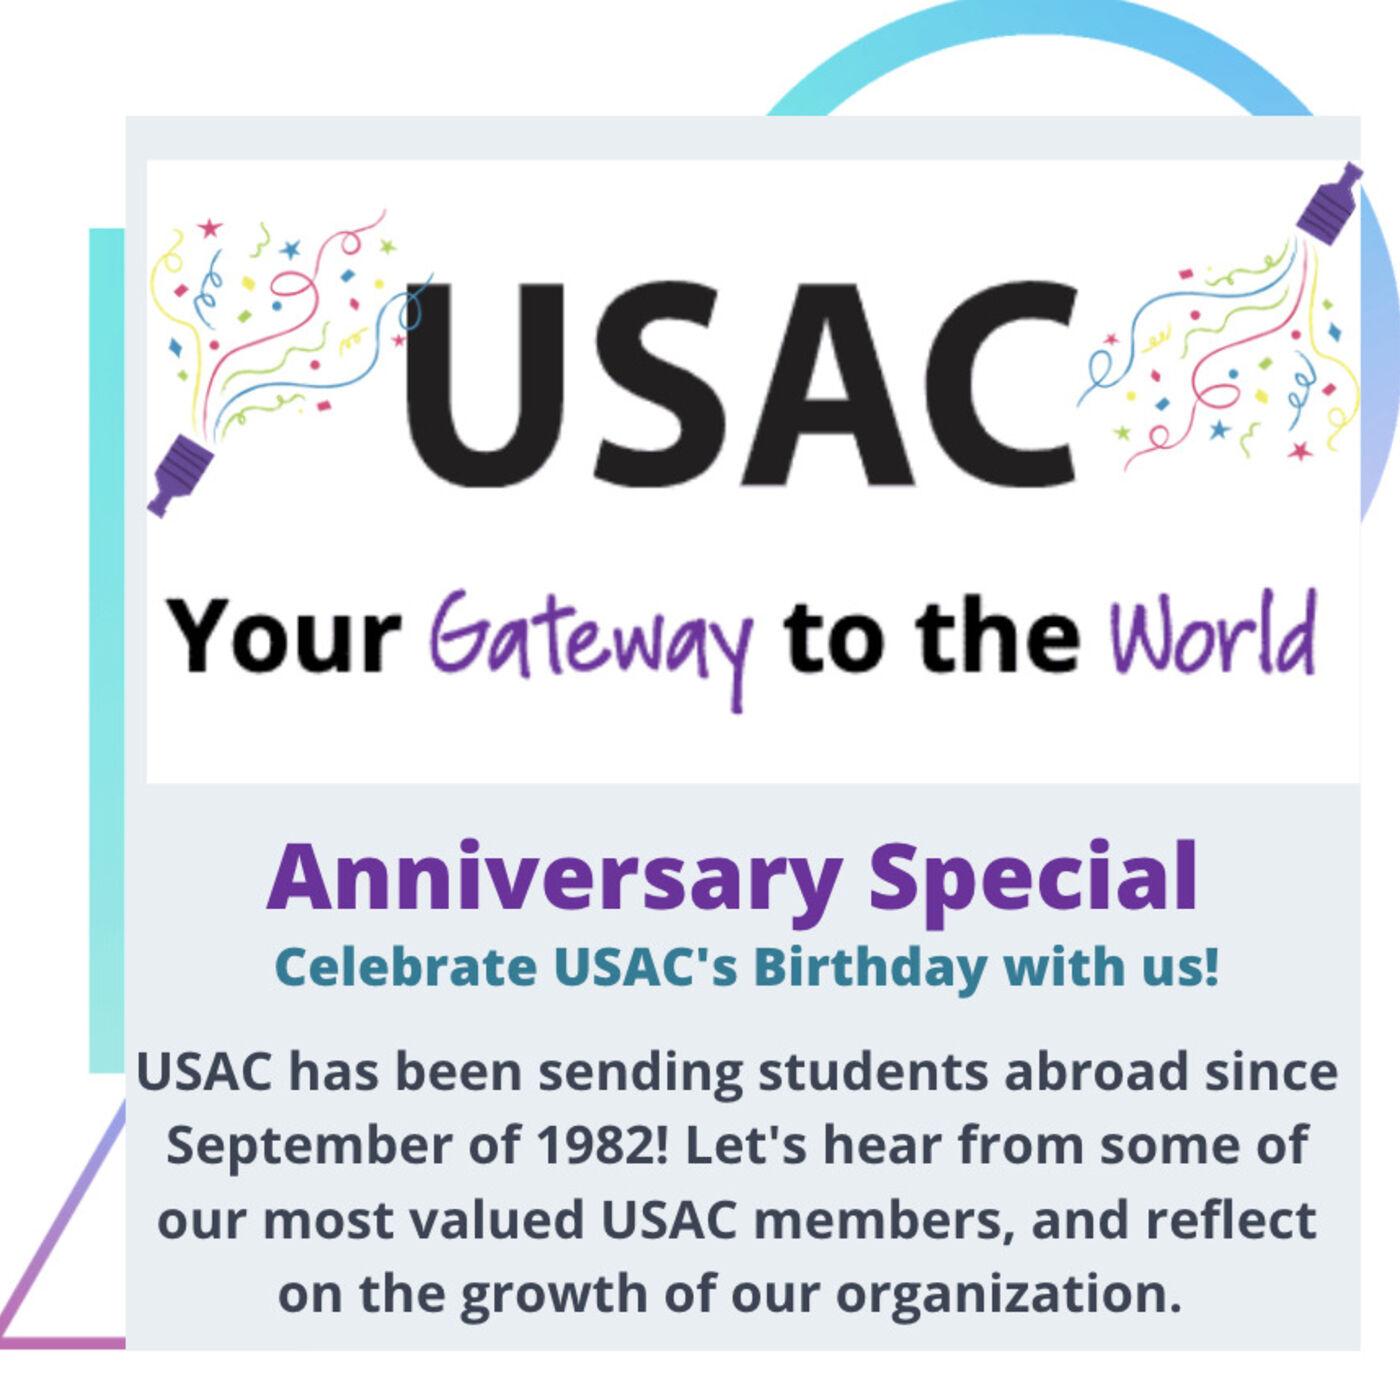 Season 3, Ep. 5 - Special Edition: USAC Turns 39!